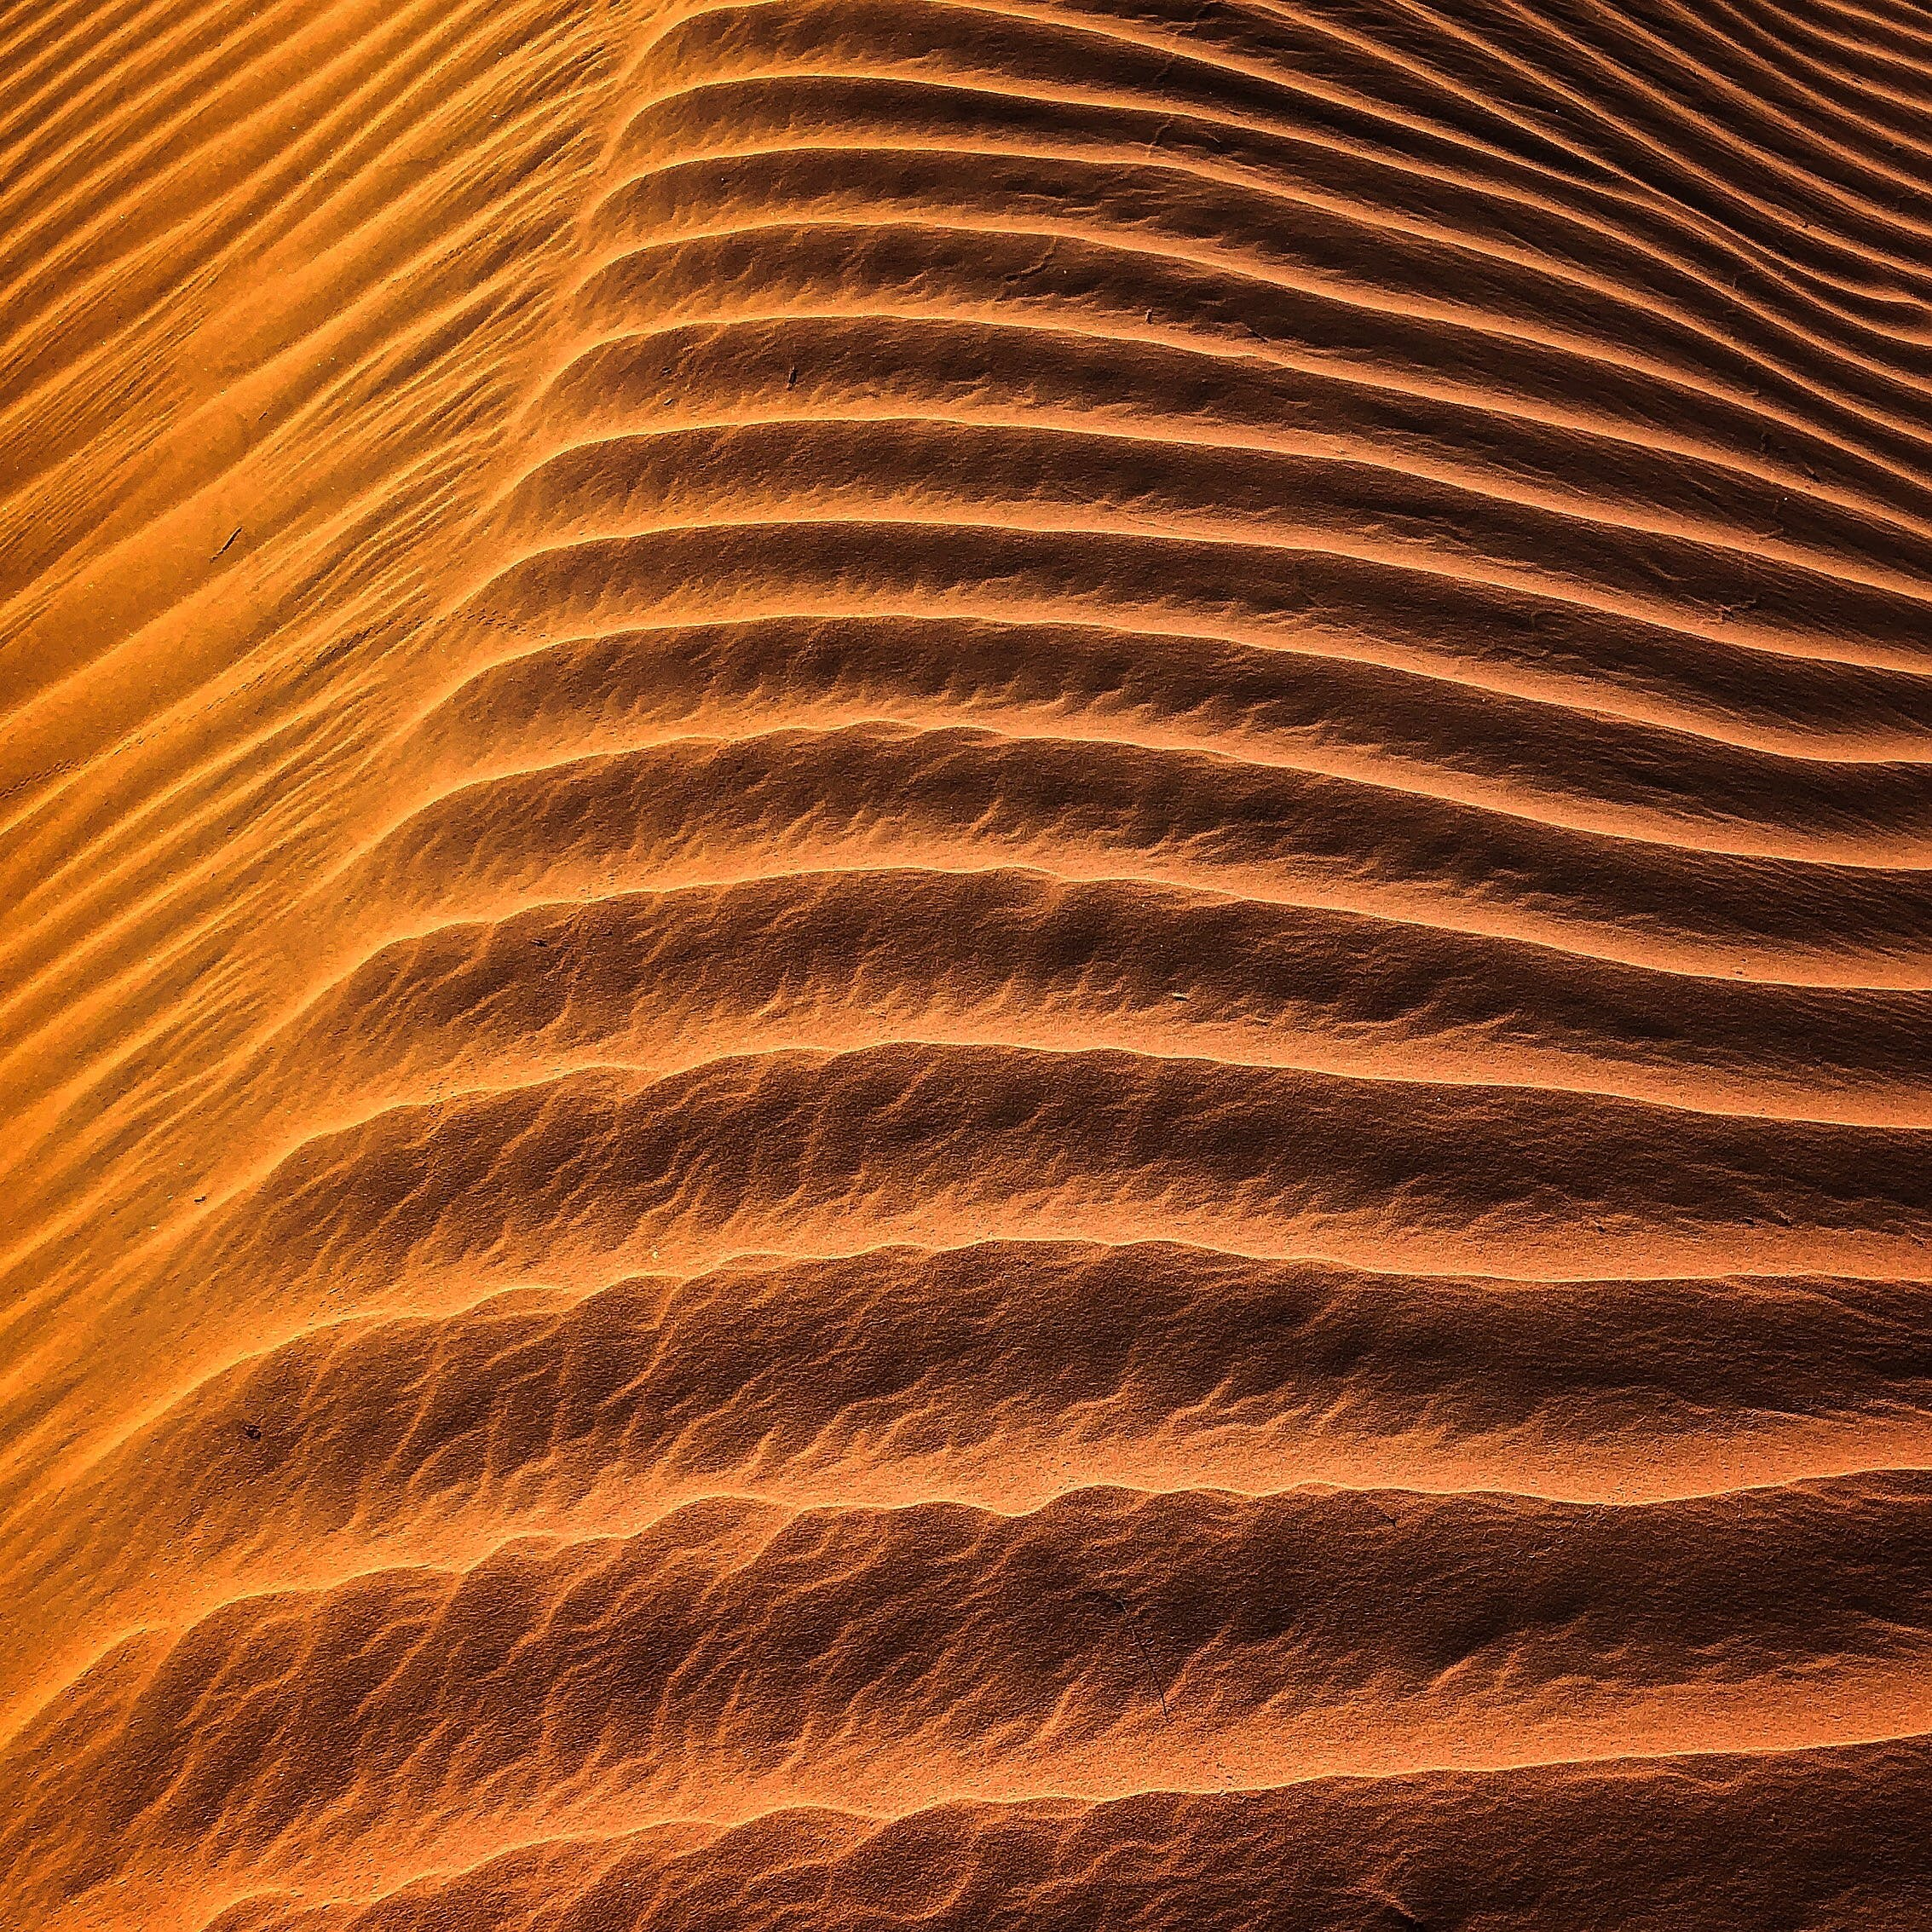 Základová fotografie zdarma na téma barvy, duny, horko, jasný